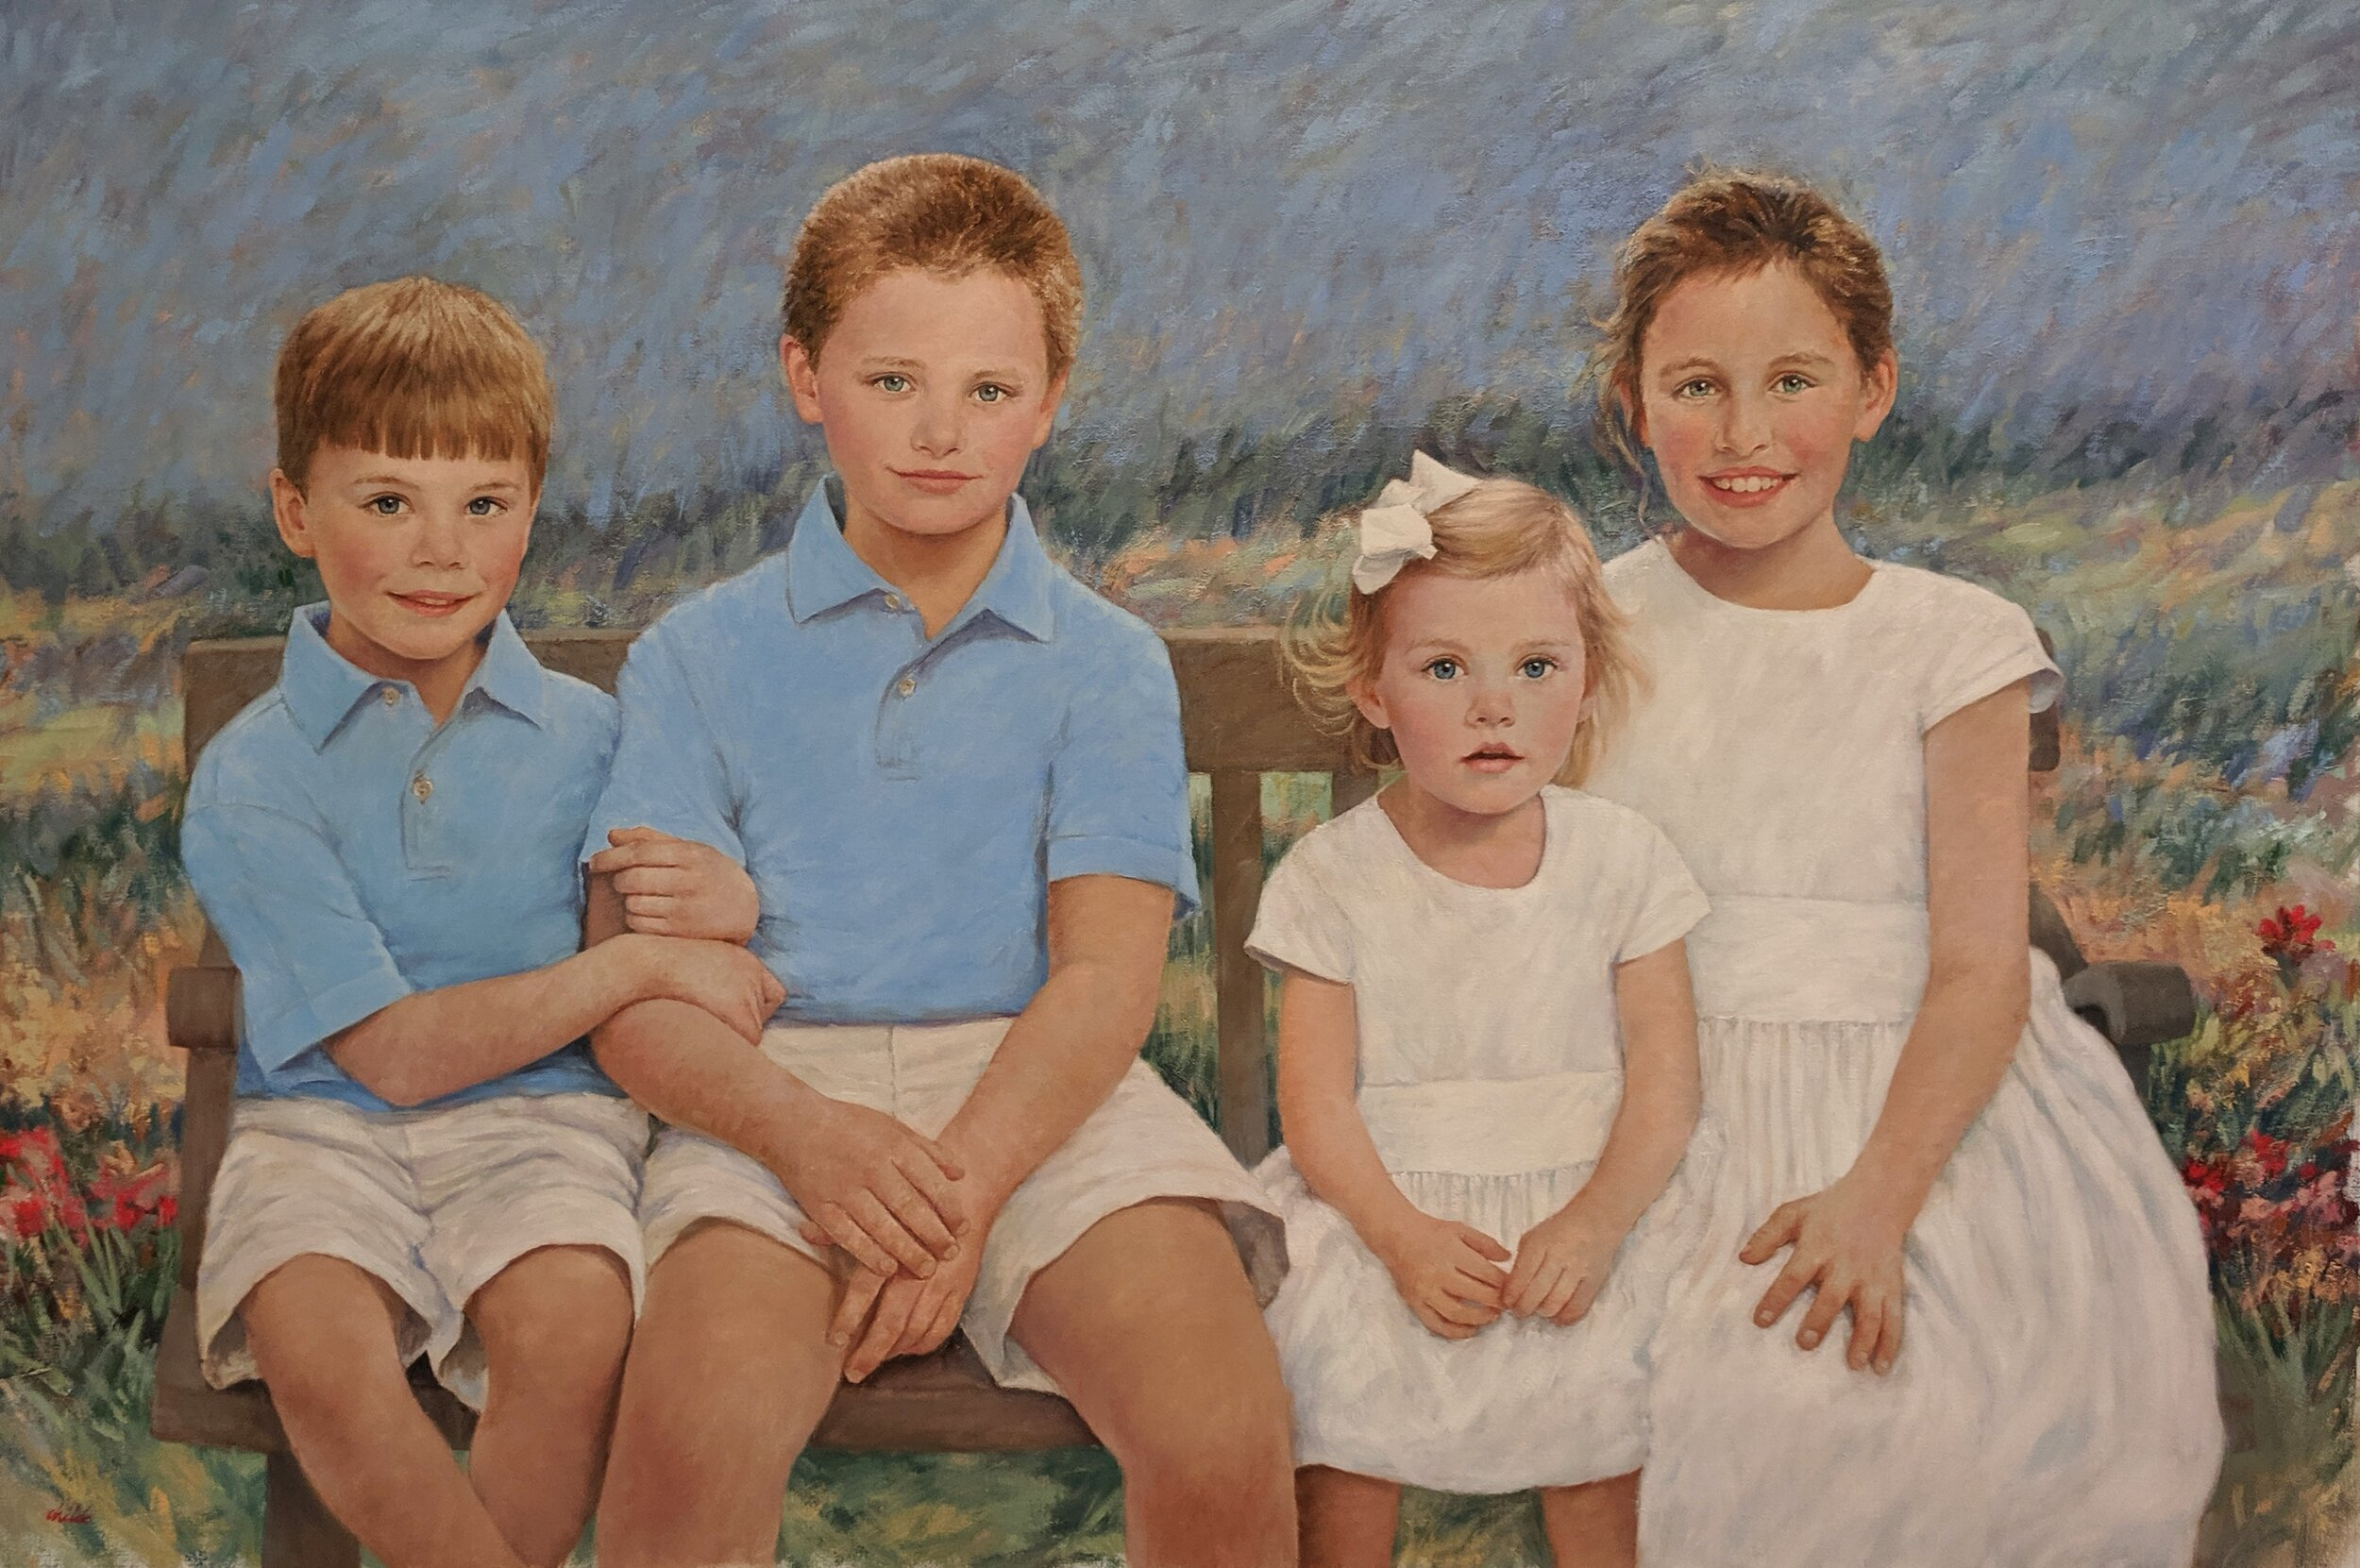 Four Children Together - 54 x 36